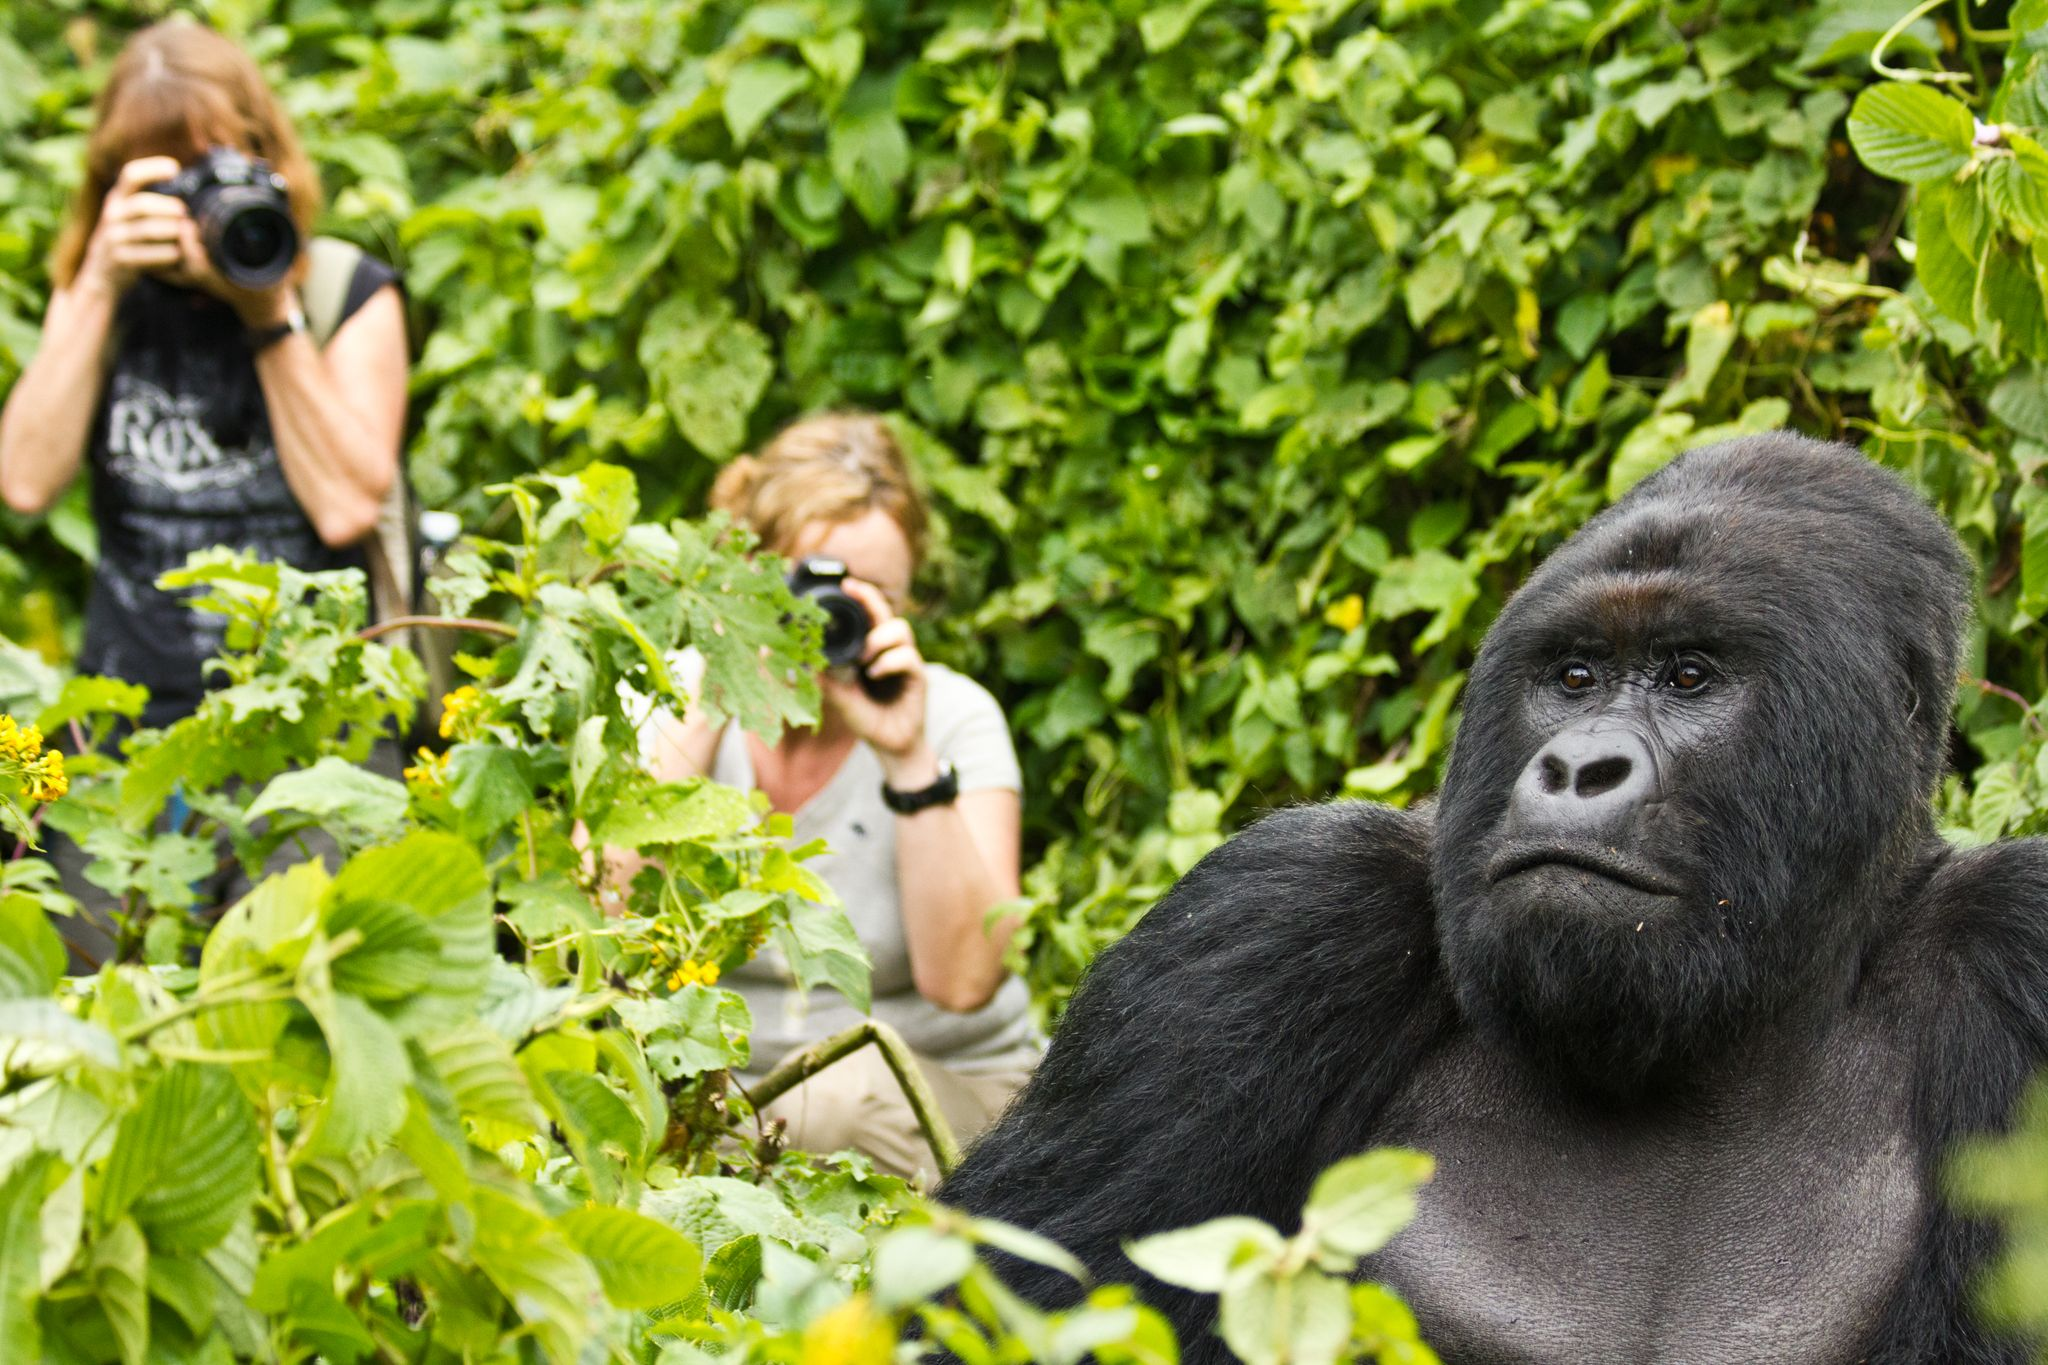 Price Gorilla Trekking Permit Discounted Permits Uganda Bwindi Forest 1